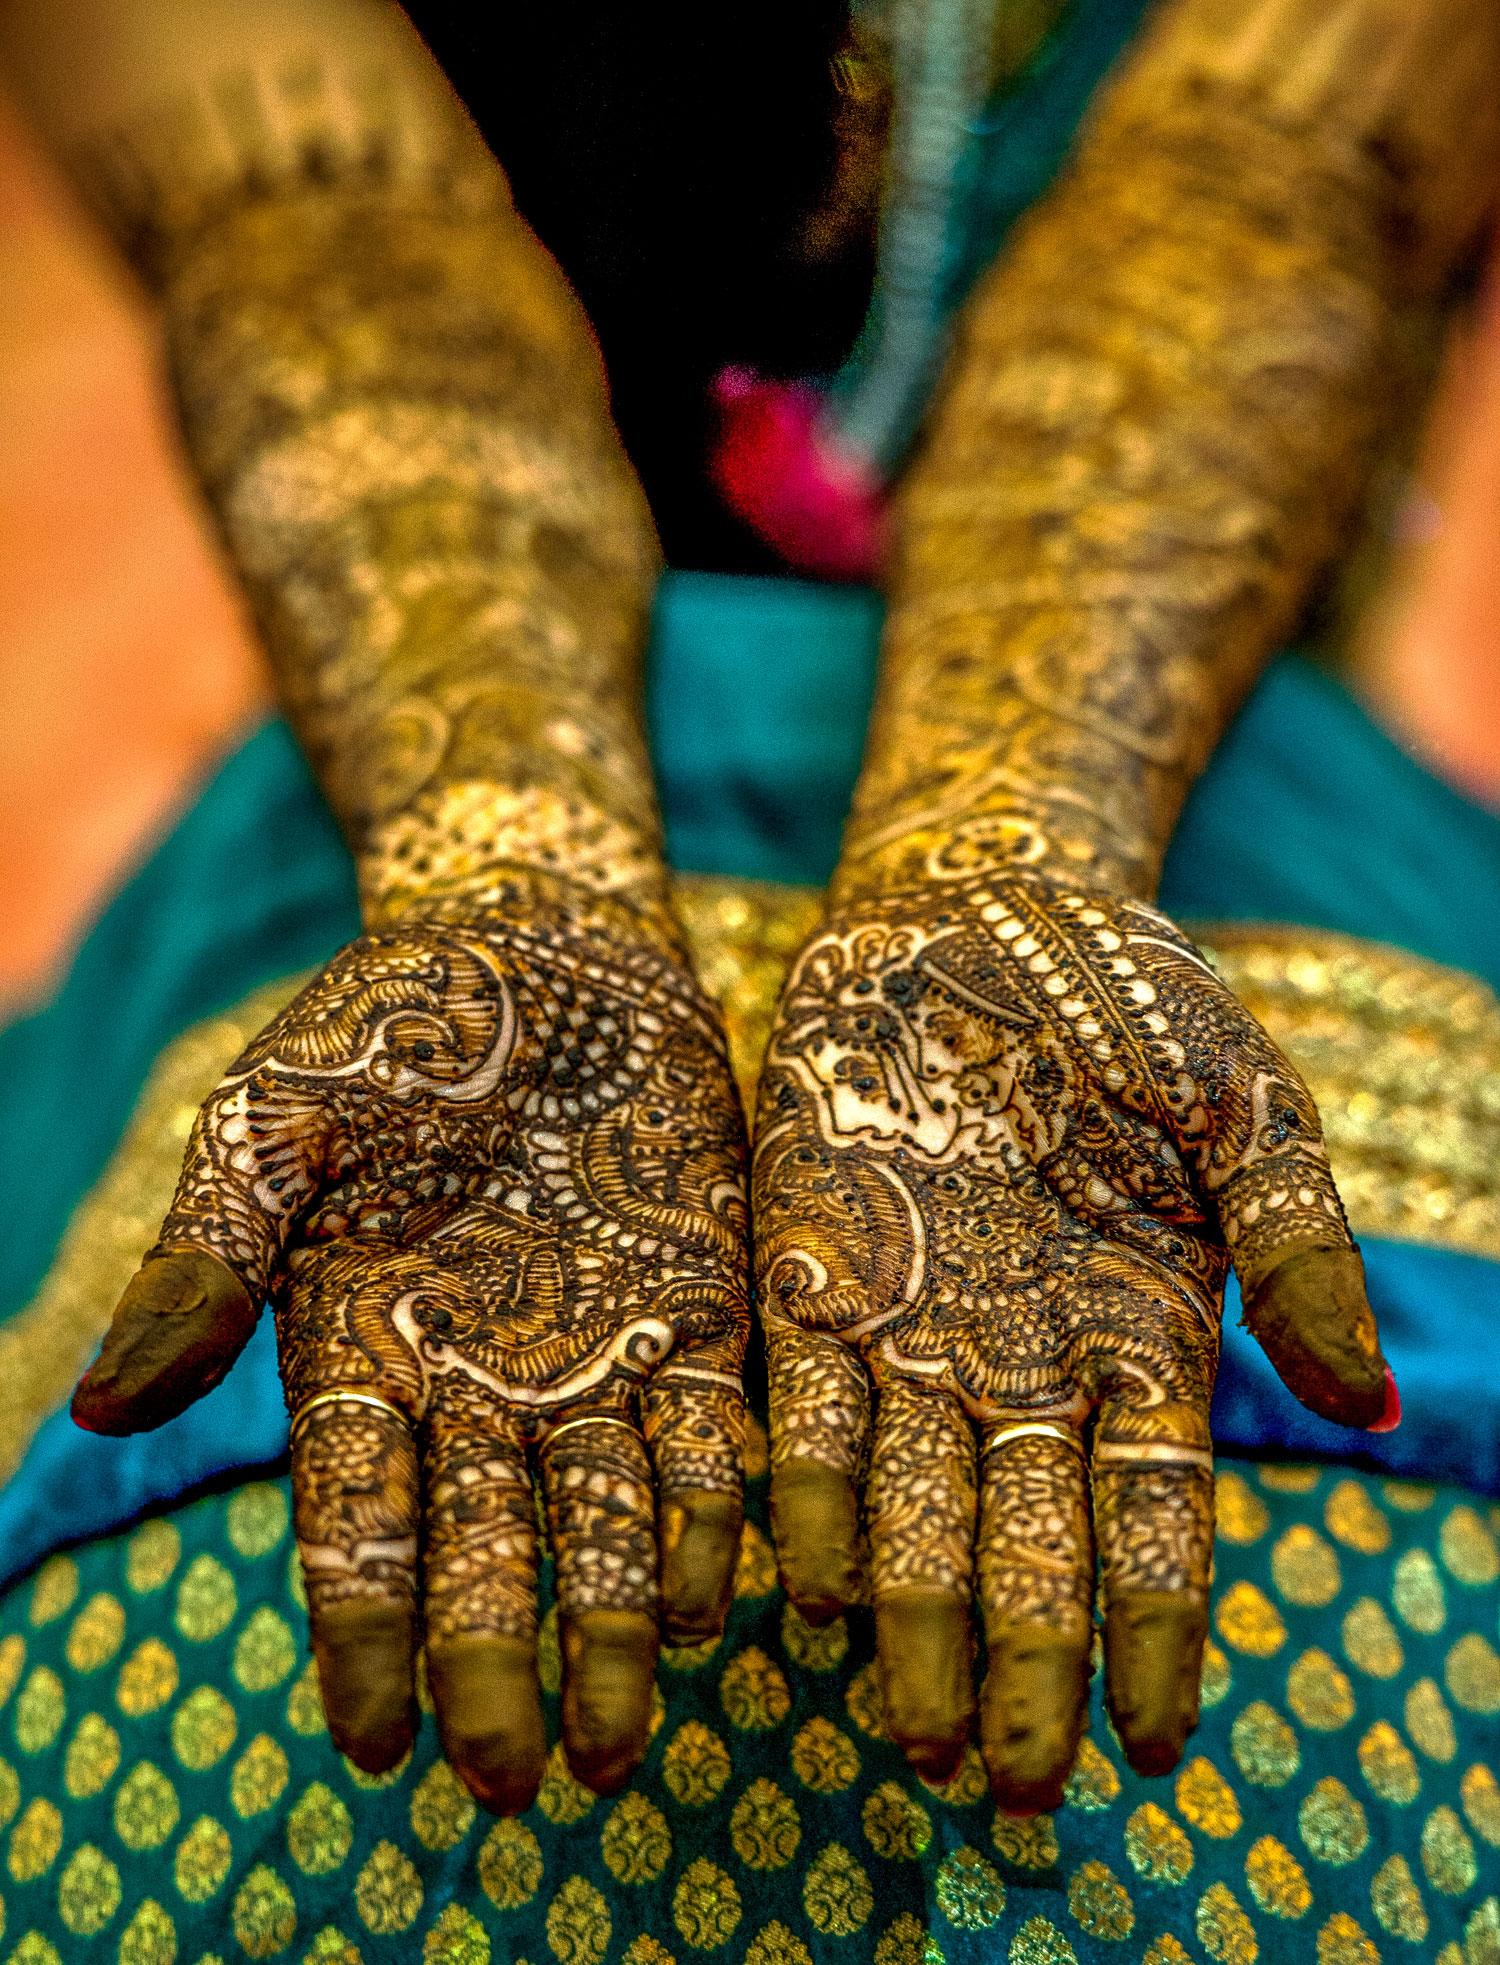 Information about Indian Mehndi Art Henna Tattoo Bridal Mehendi Photos